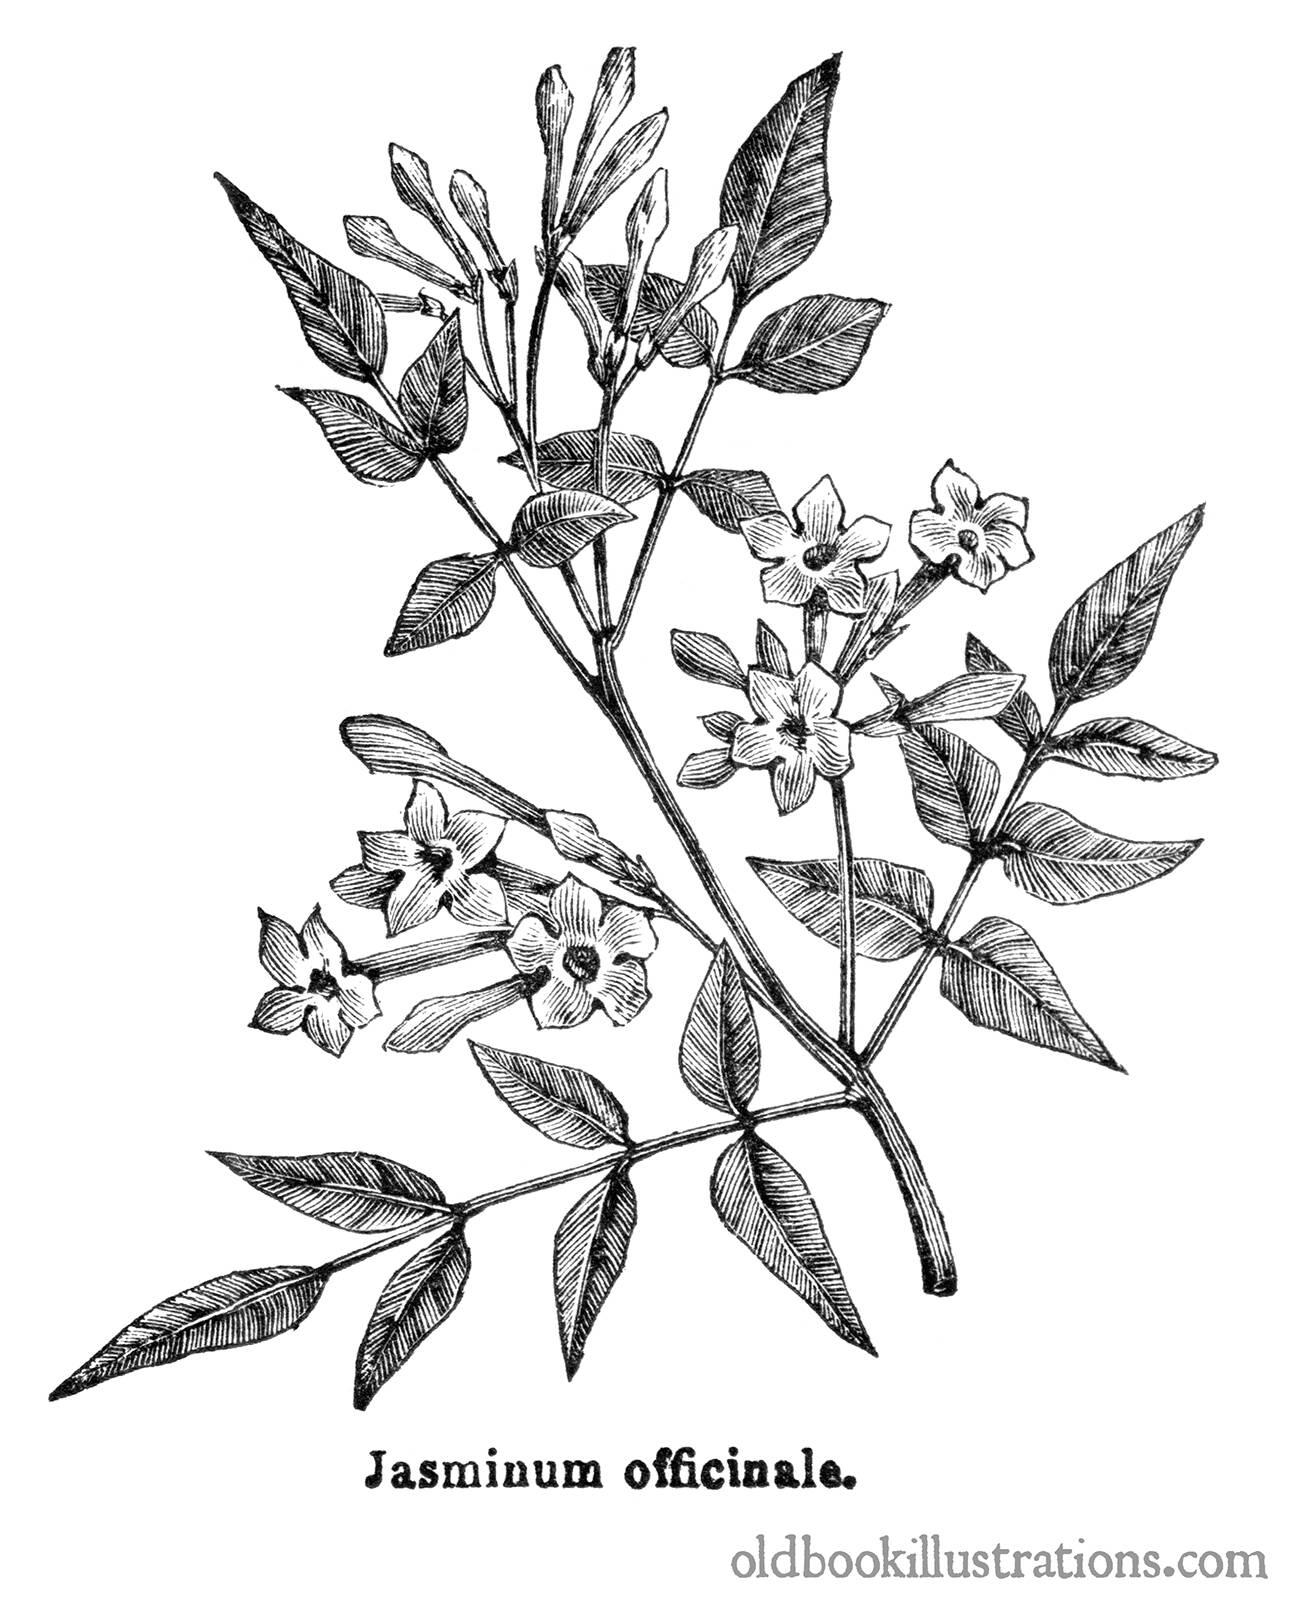 Common Jasmine Old Book Illustrations